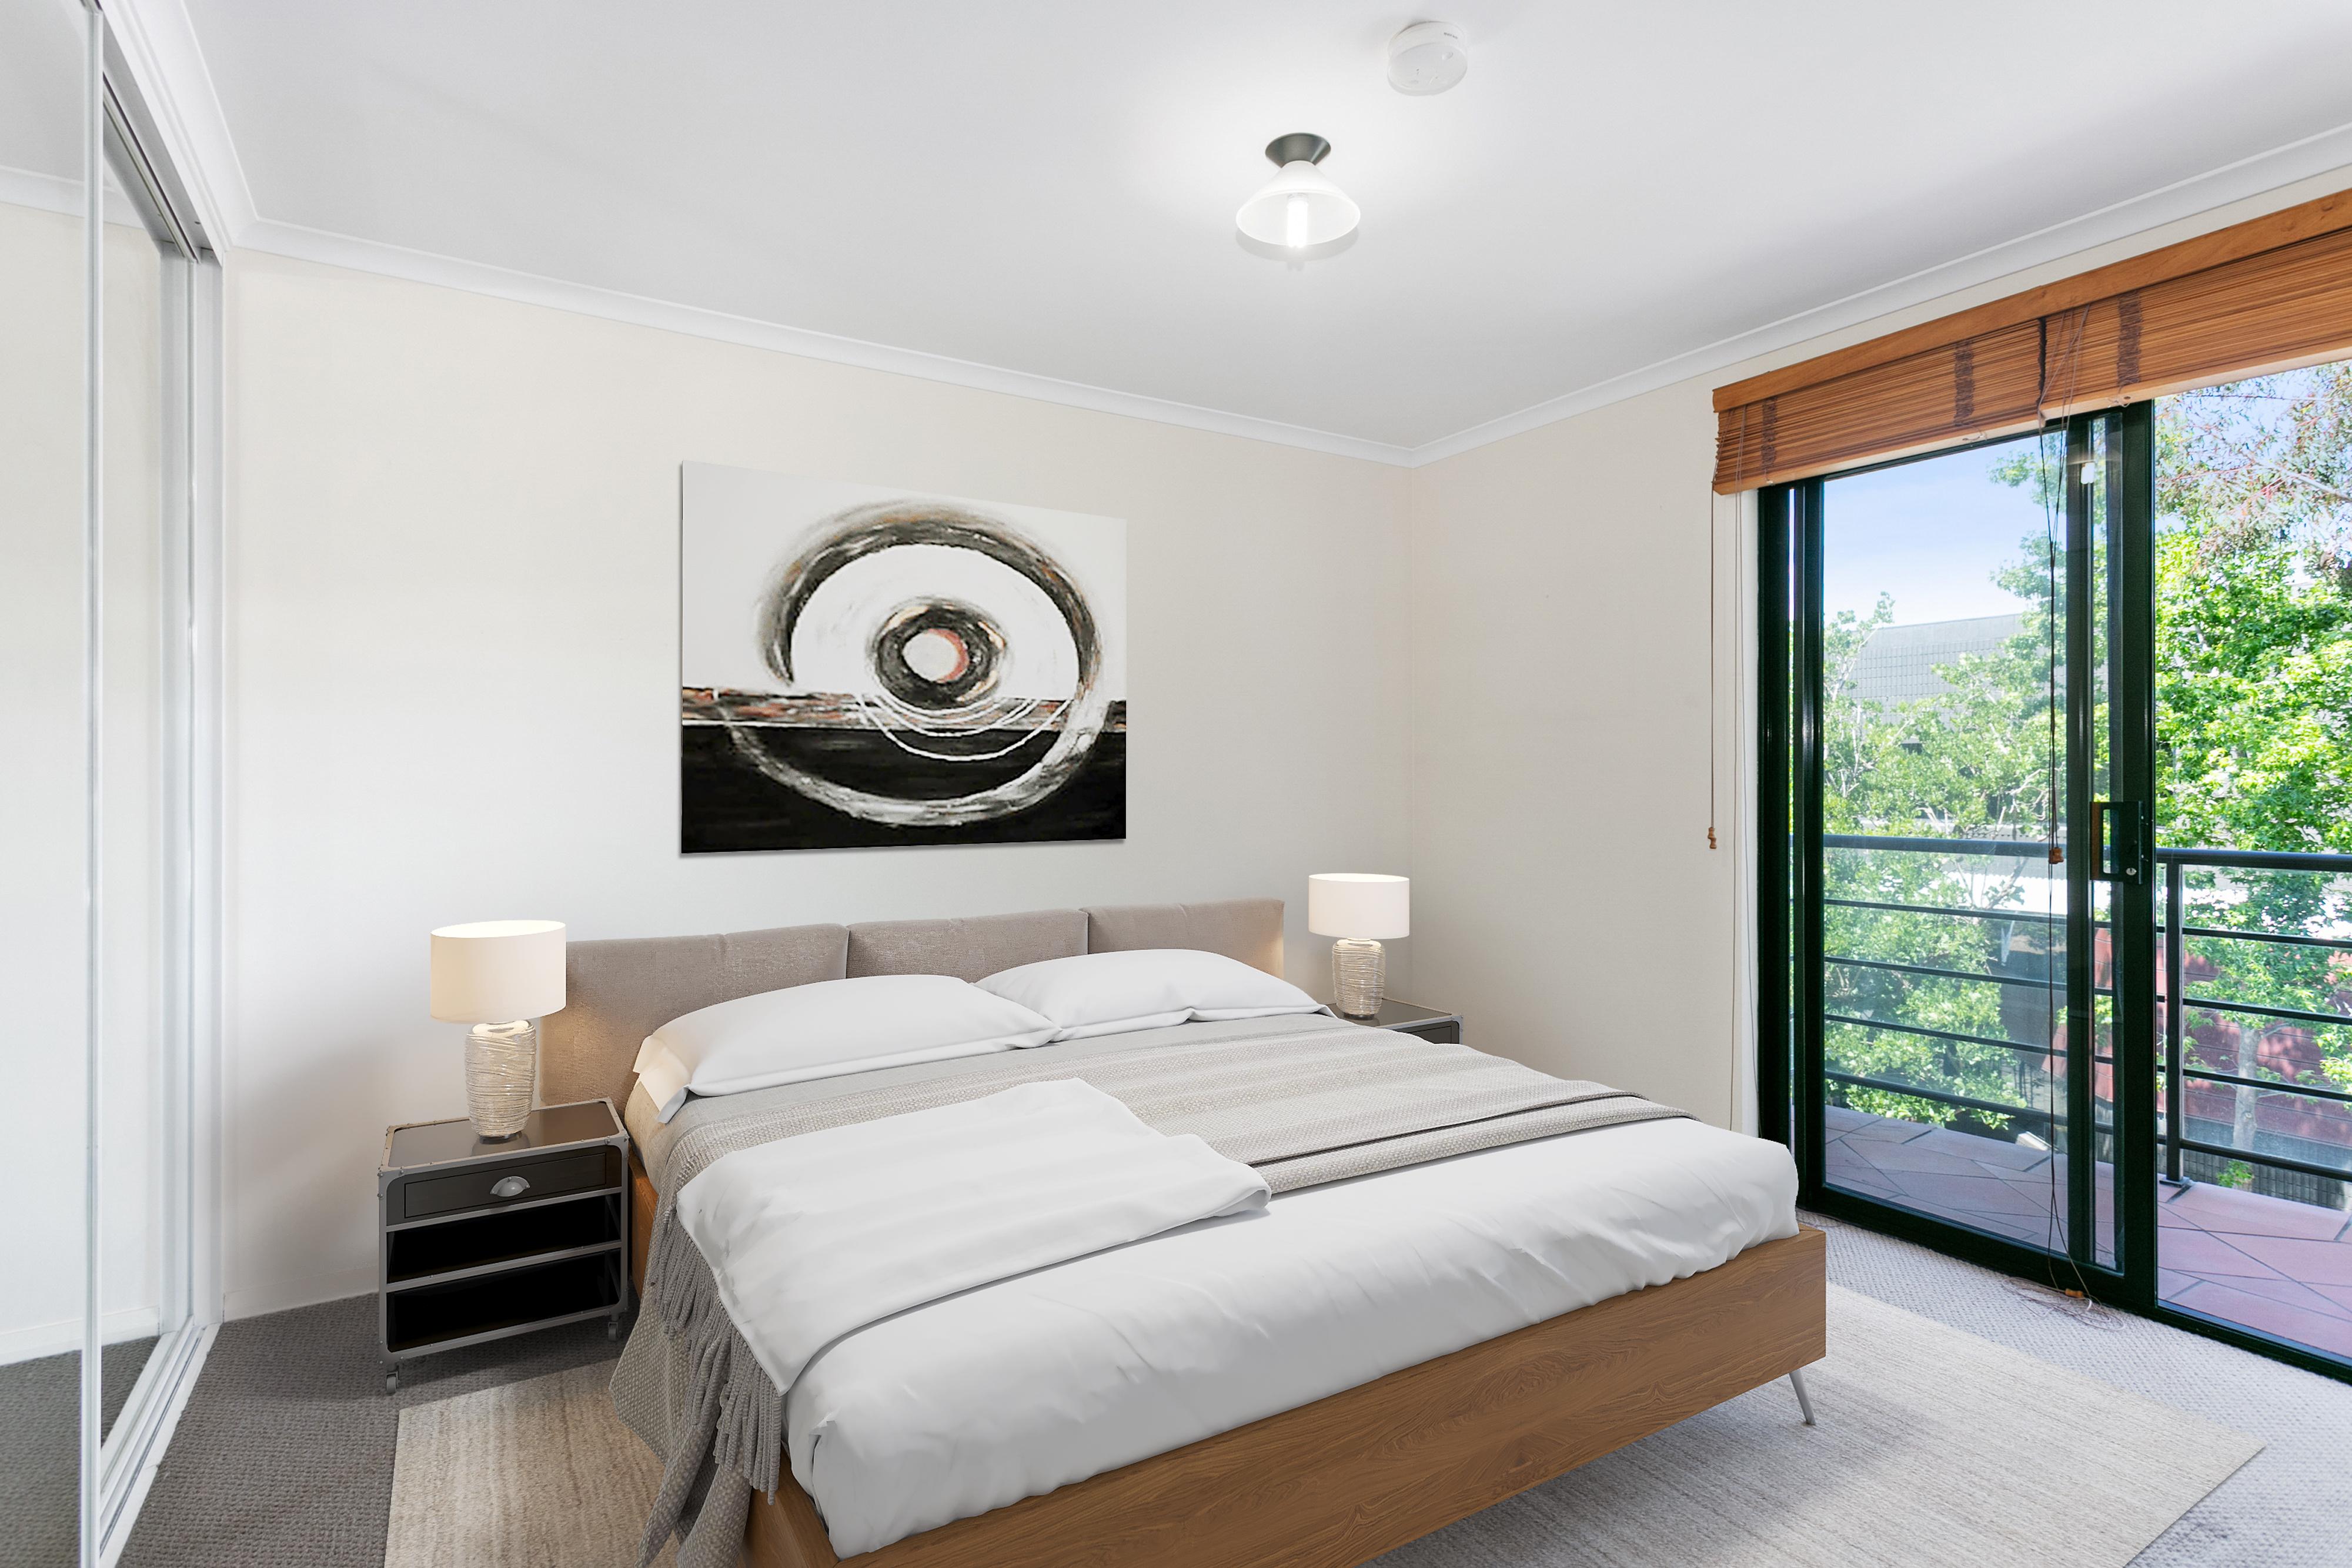 Virtual bed 1